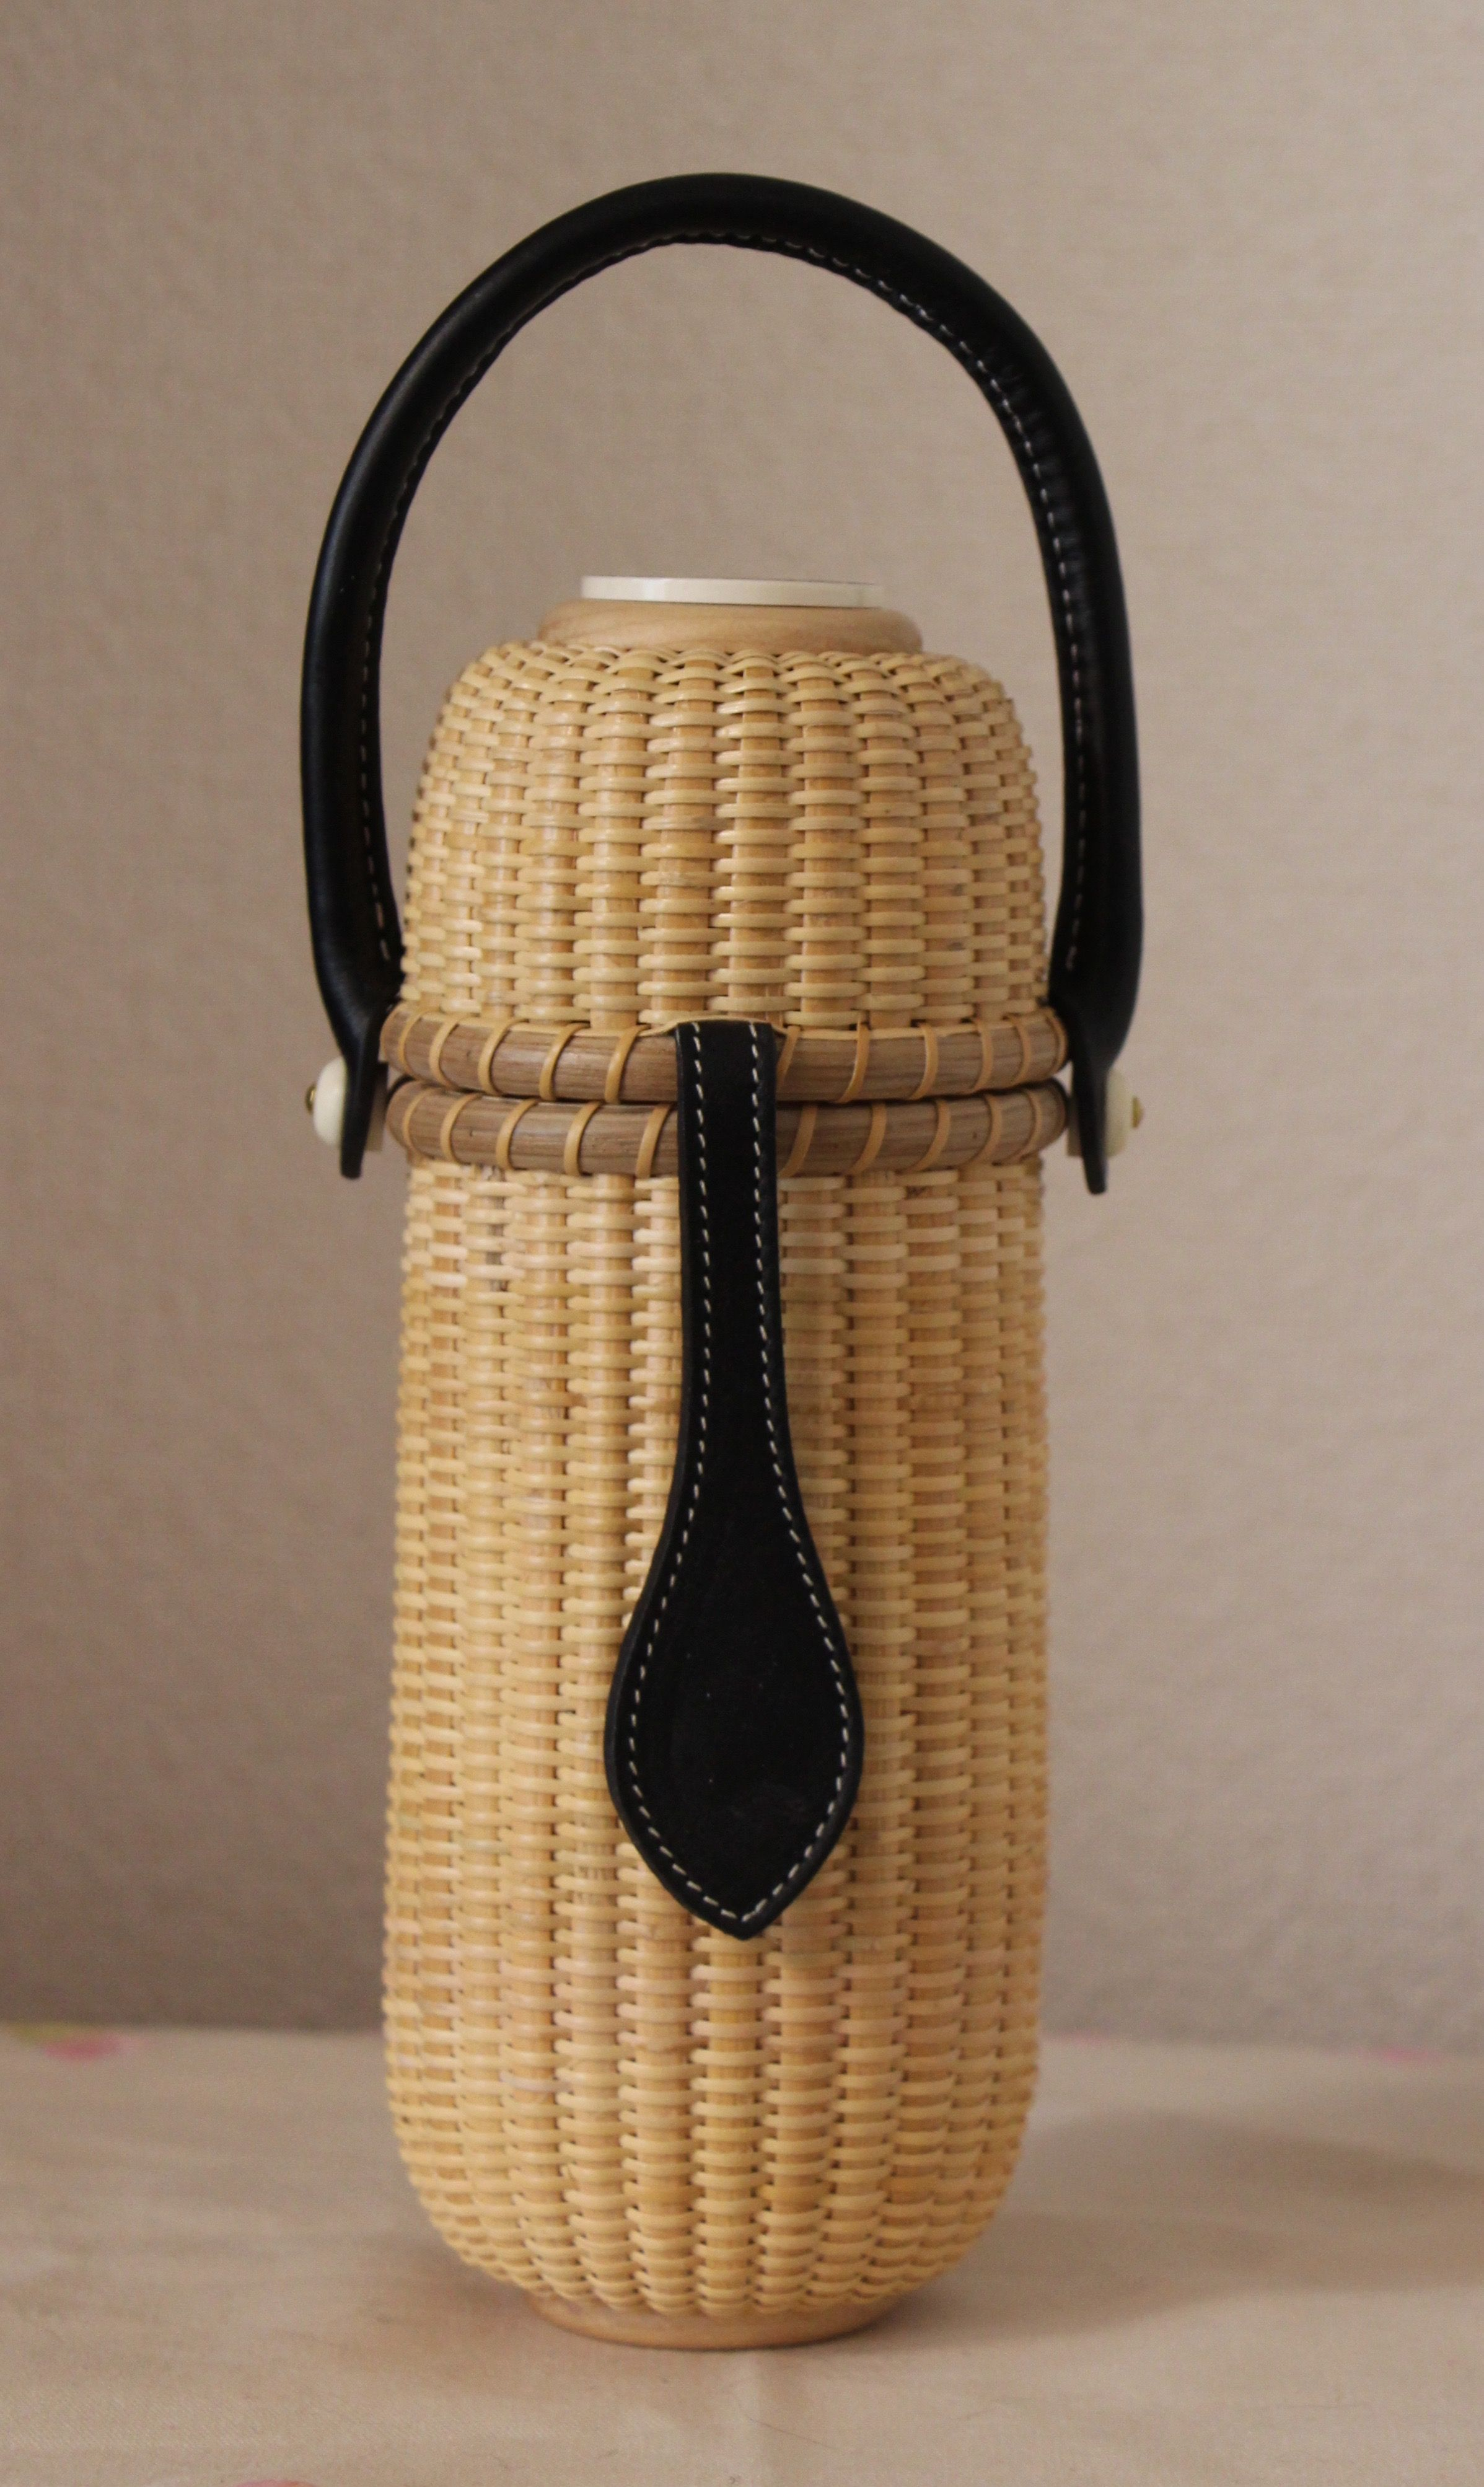 Handmade Nantucket Basket : Nantucket basket inch round bottle keeper handmade